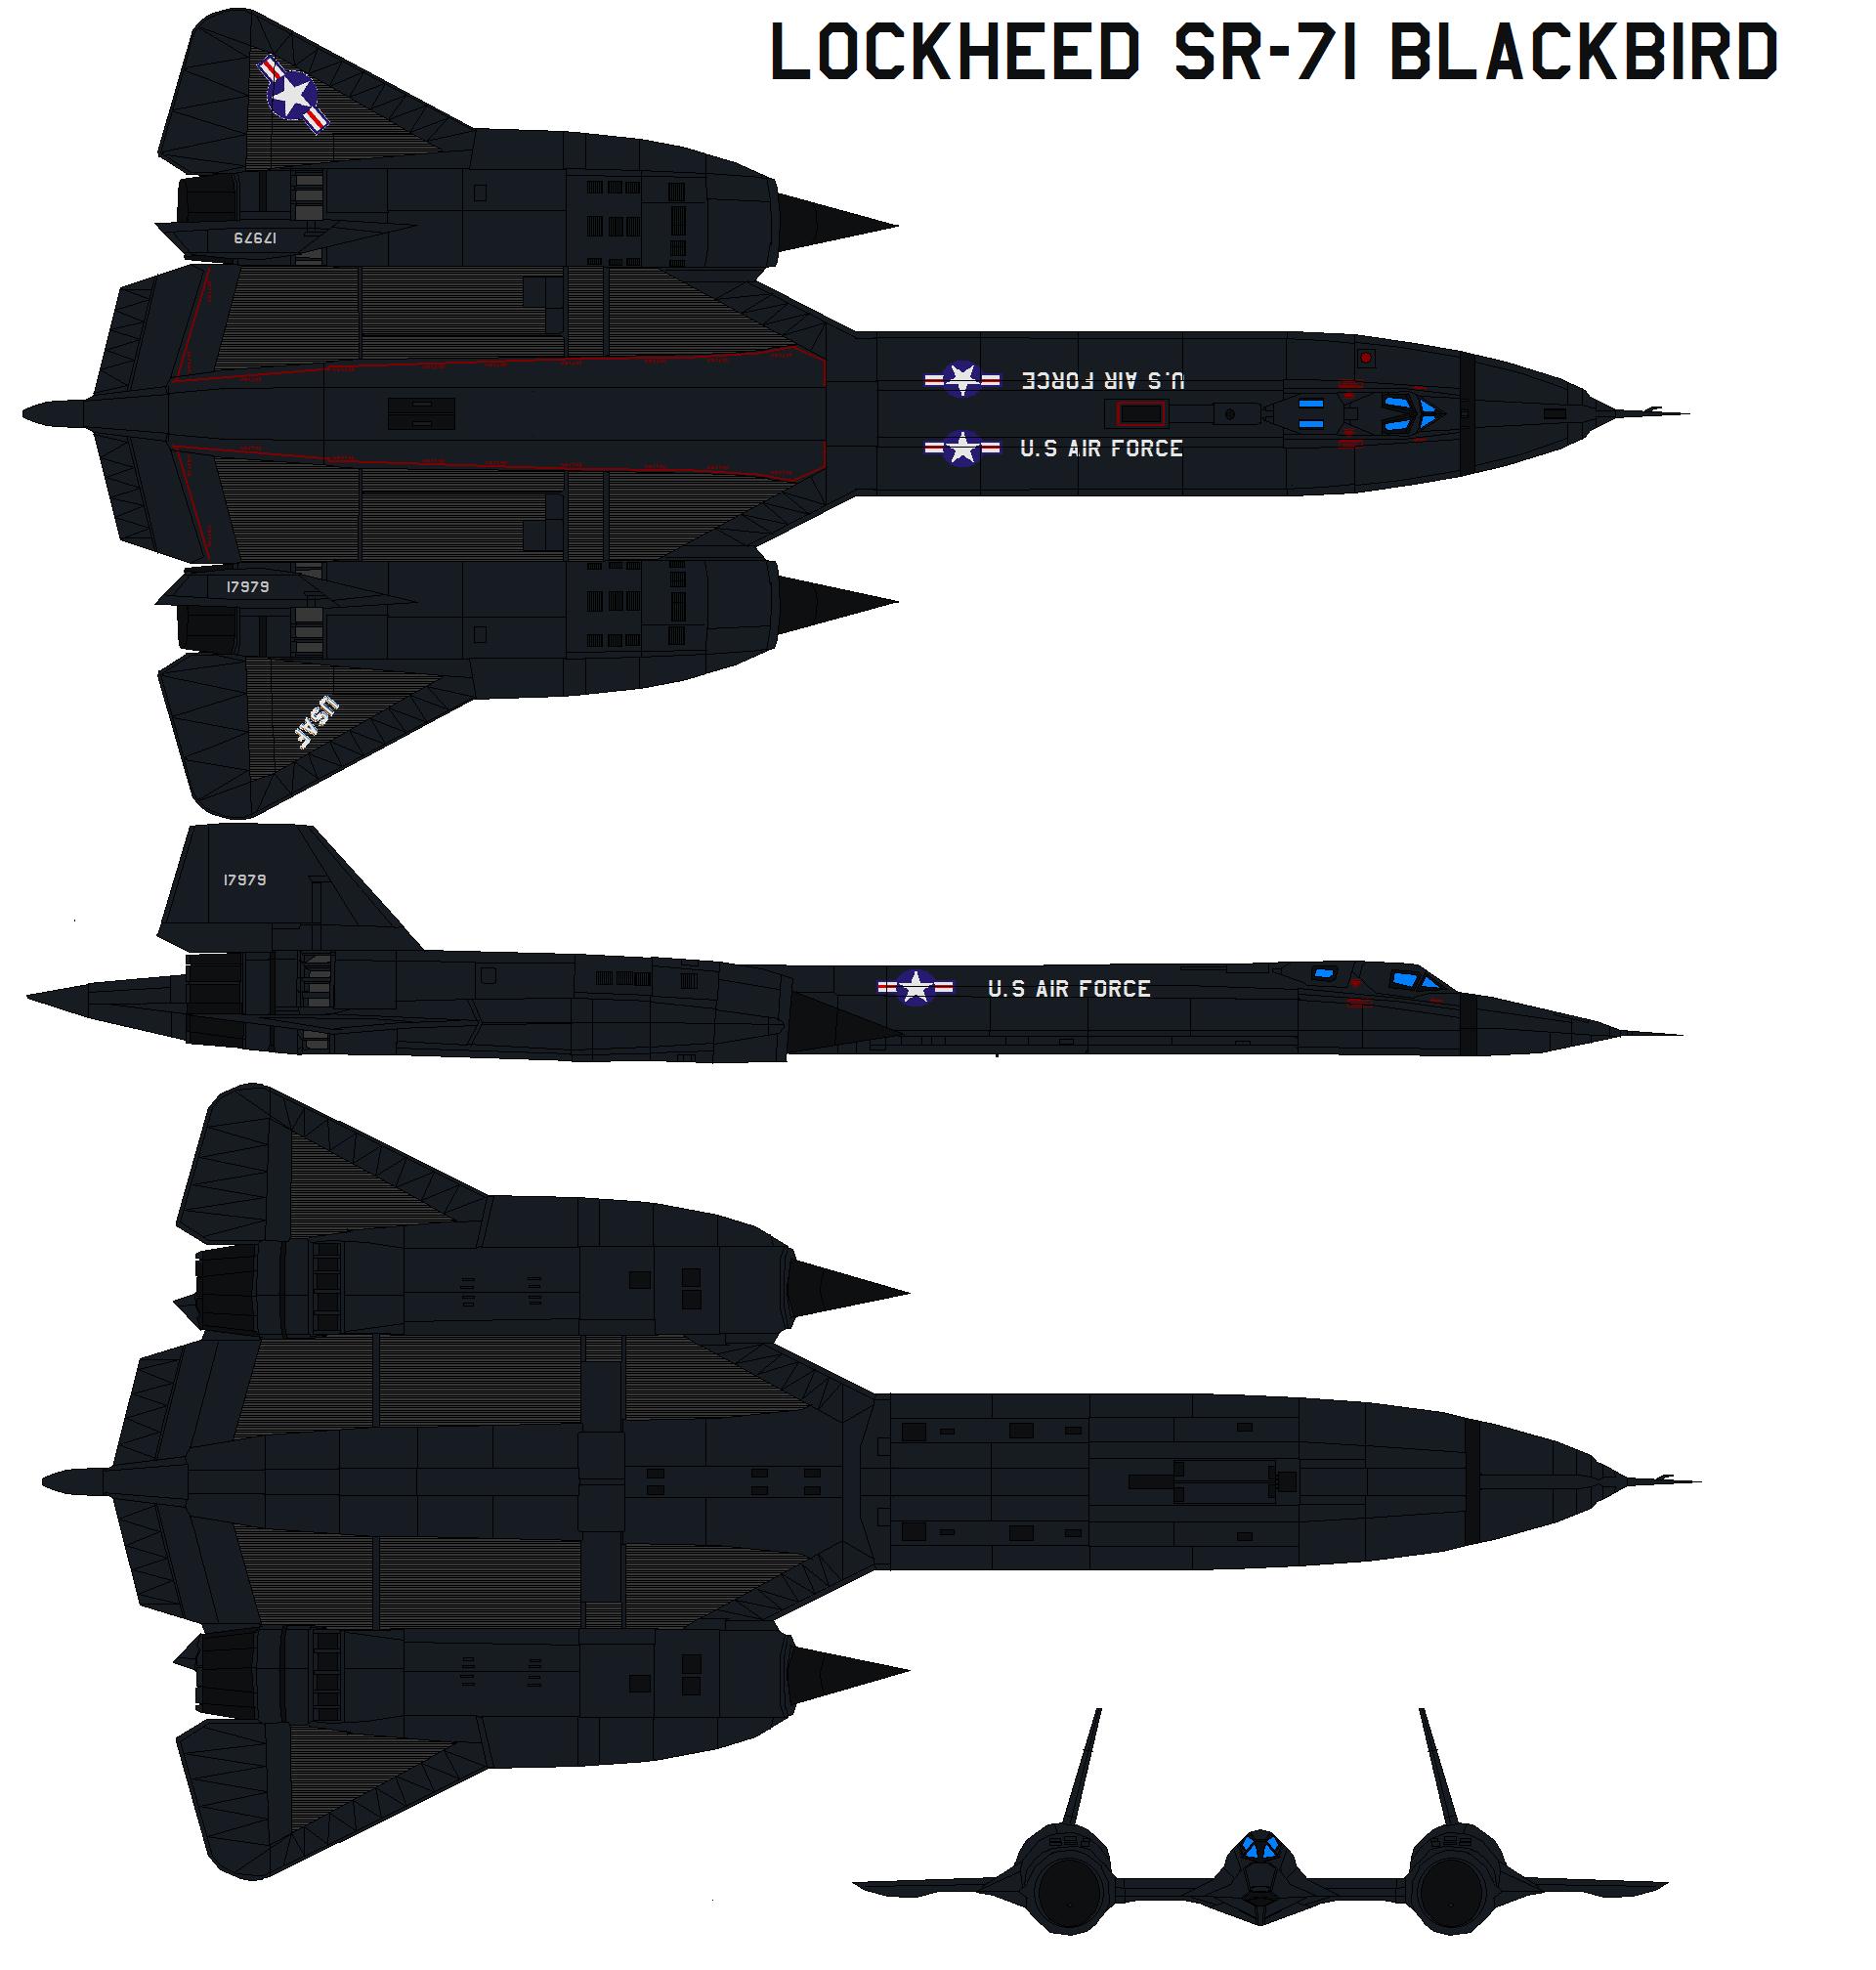 SR-71 blackbird by bagera3005